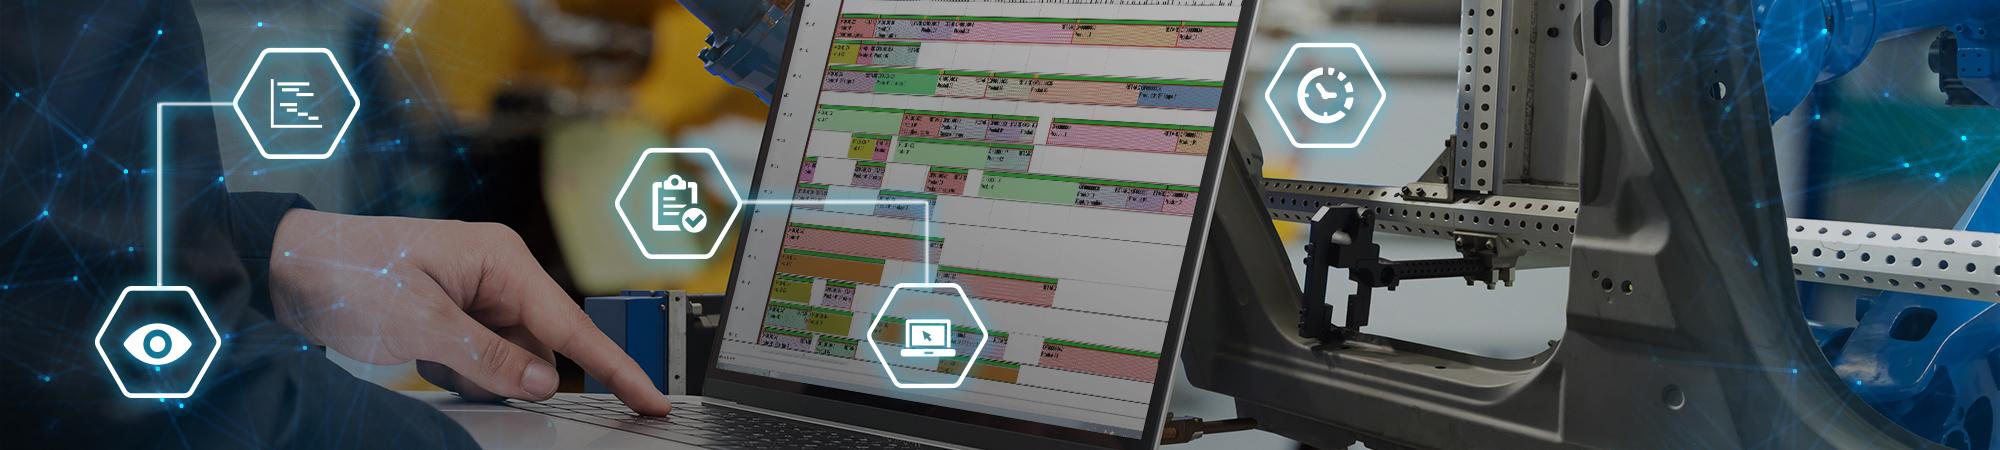 scheduling industrial software